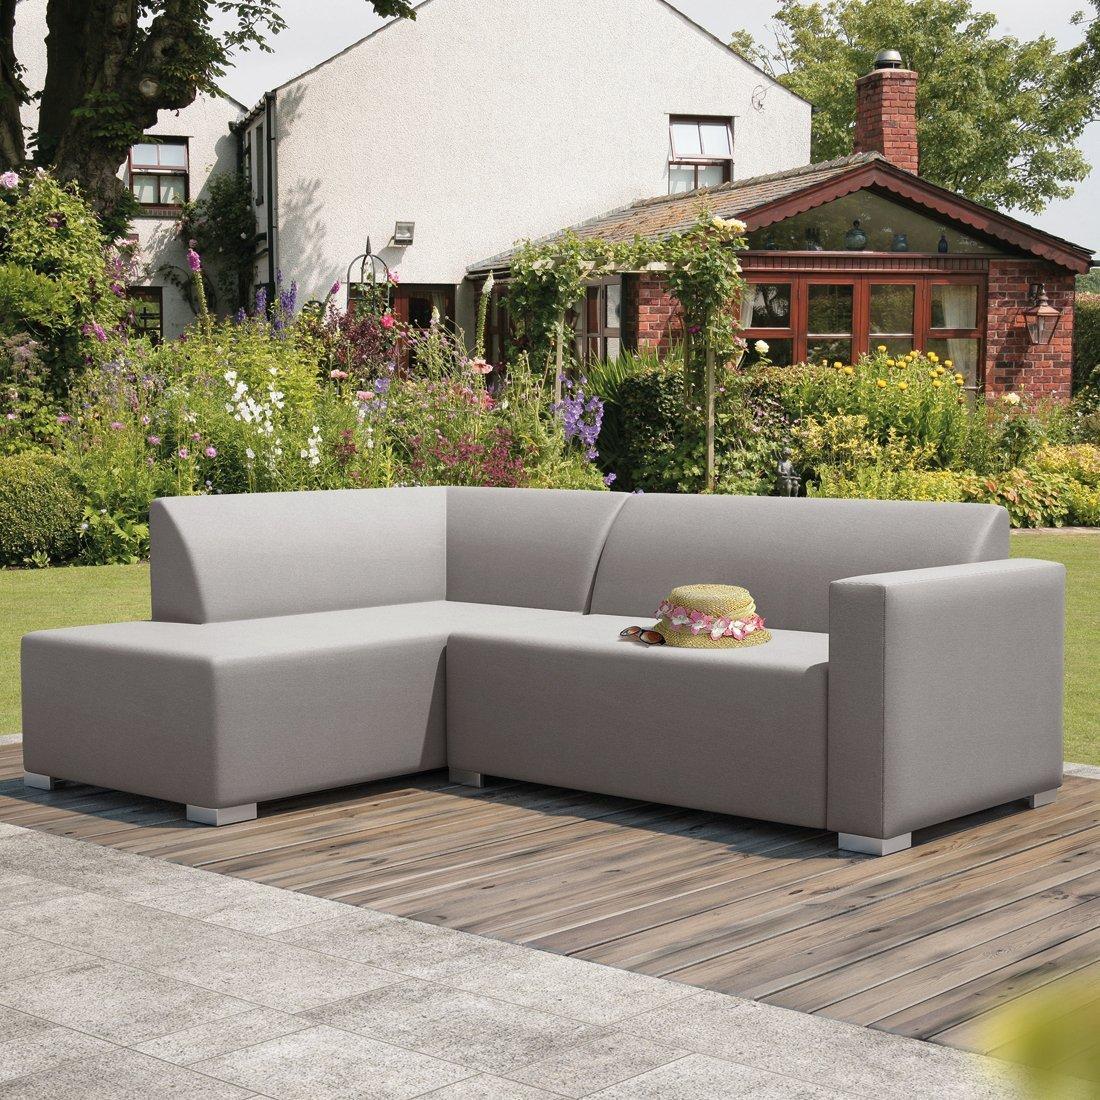 AuthenTEAK 2-Piece Angle Luxury Modern Deep Seating Sectional - (Light Grey)